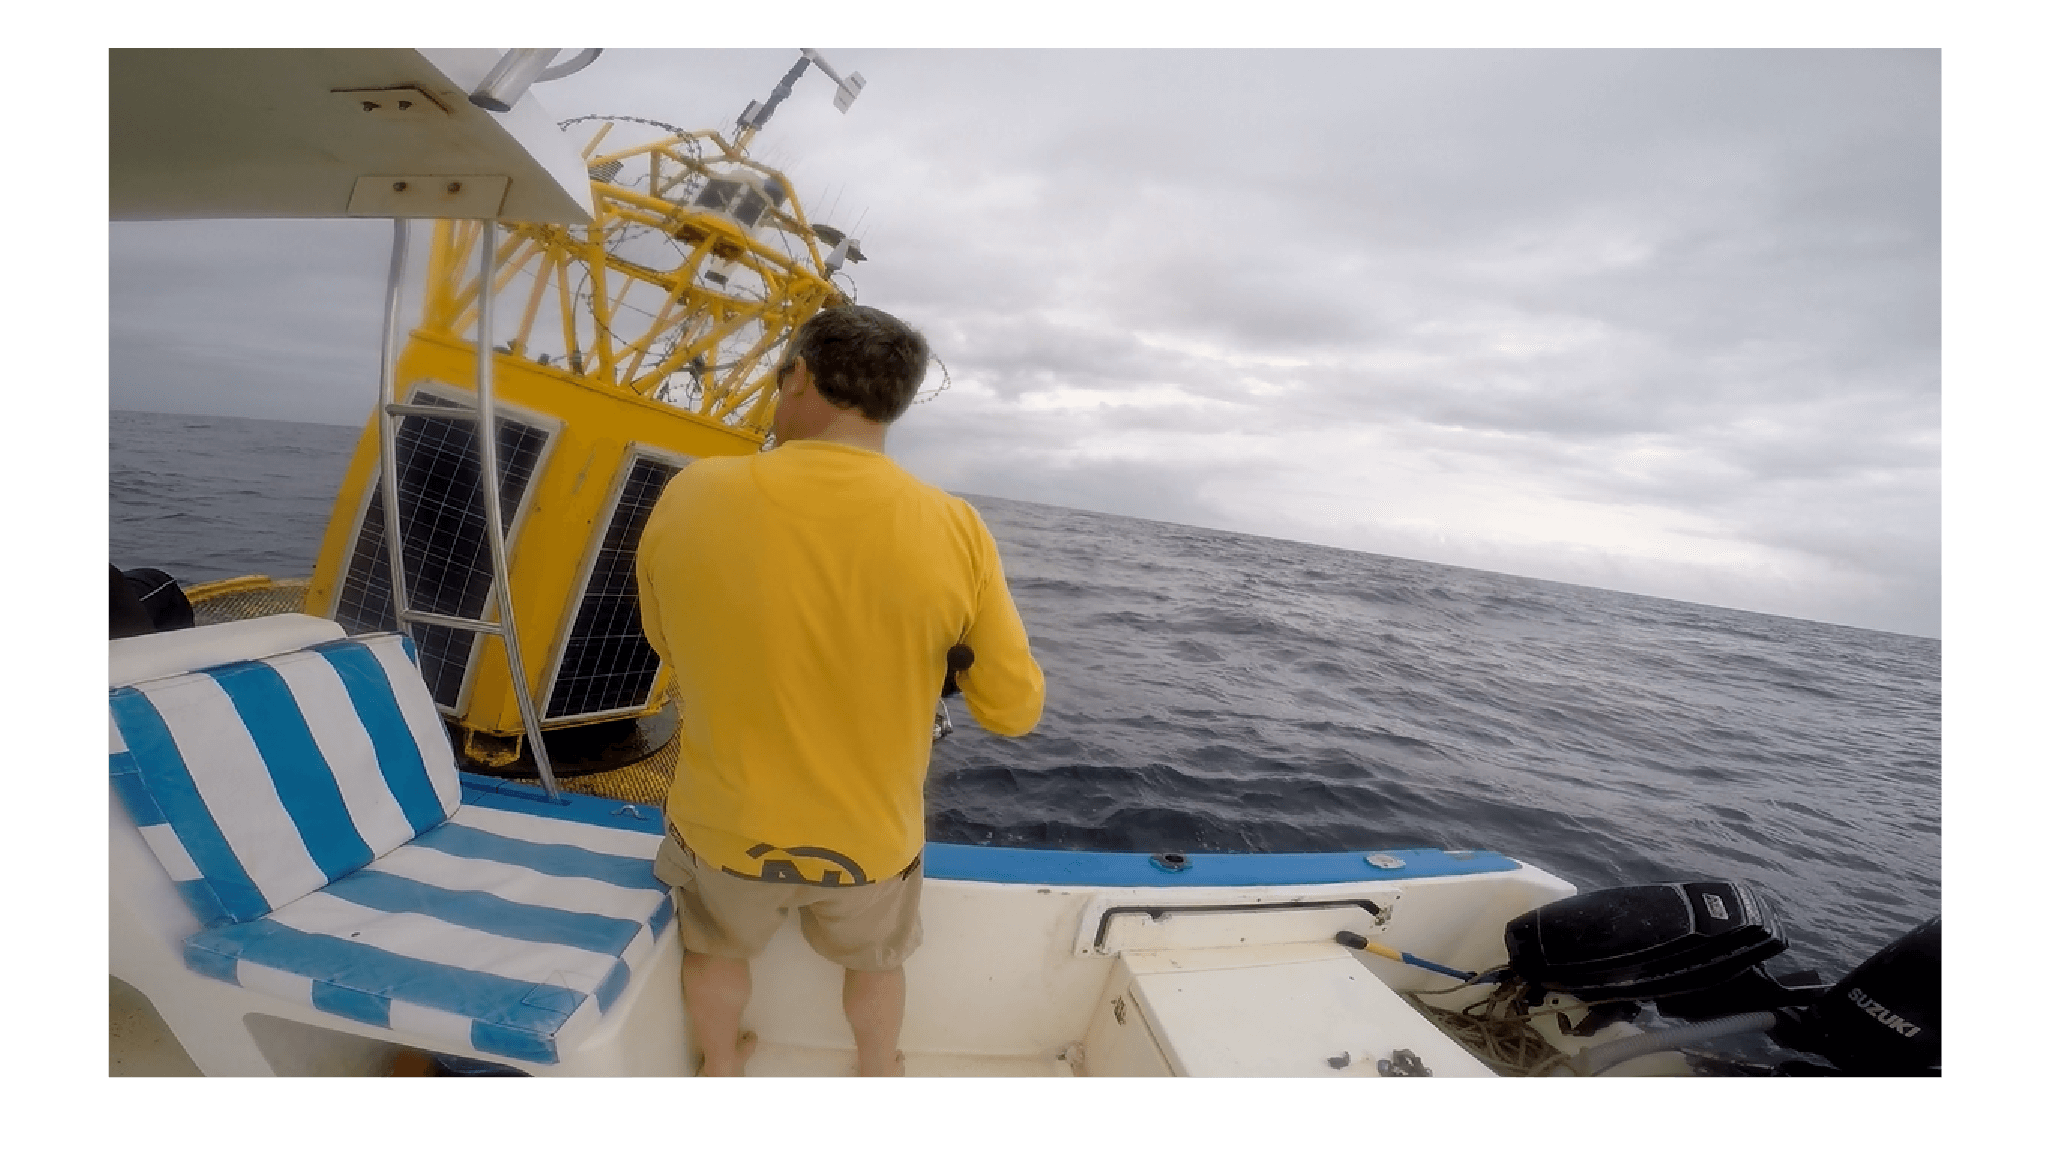 Pesca Dakar, NGor 2016